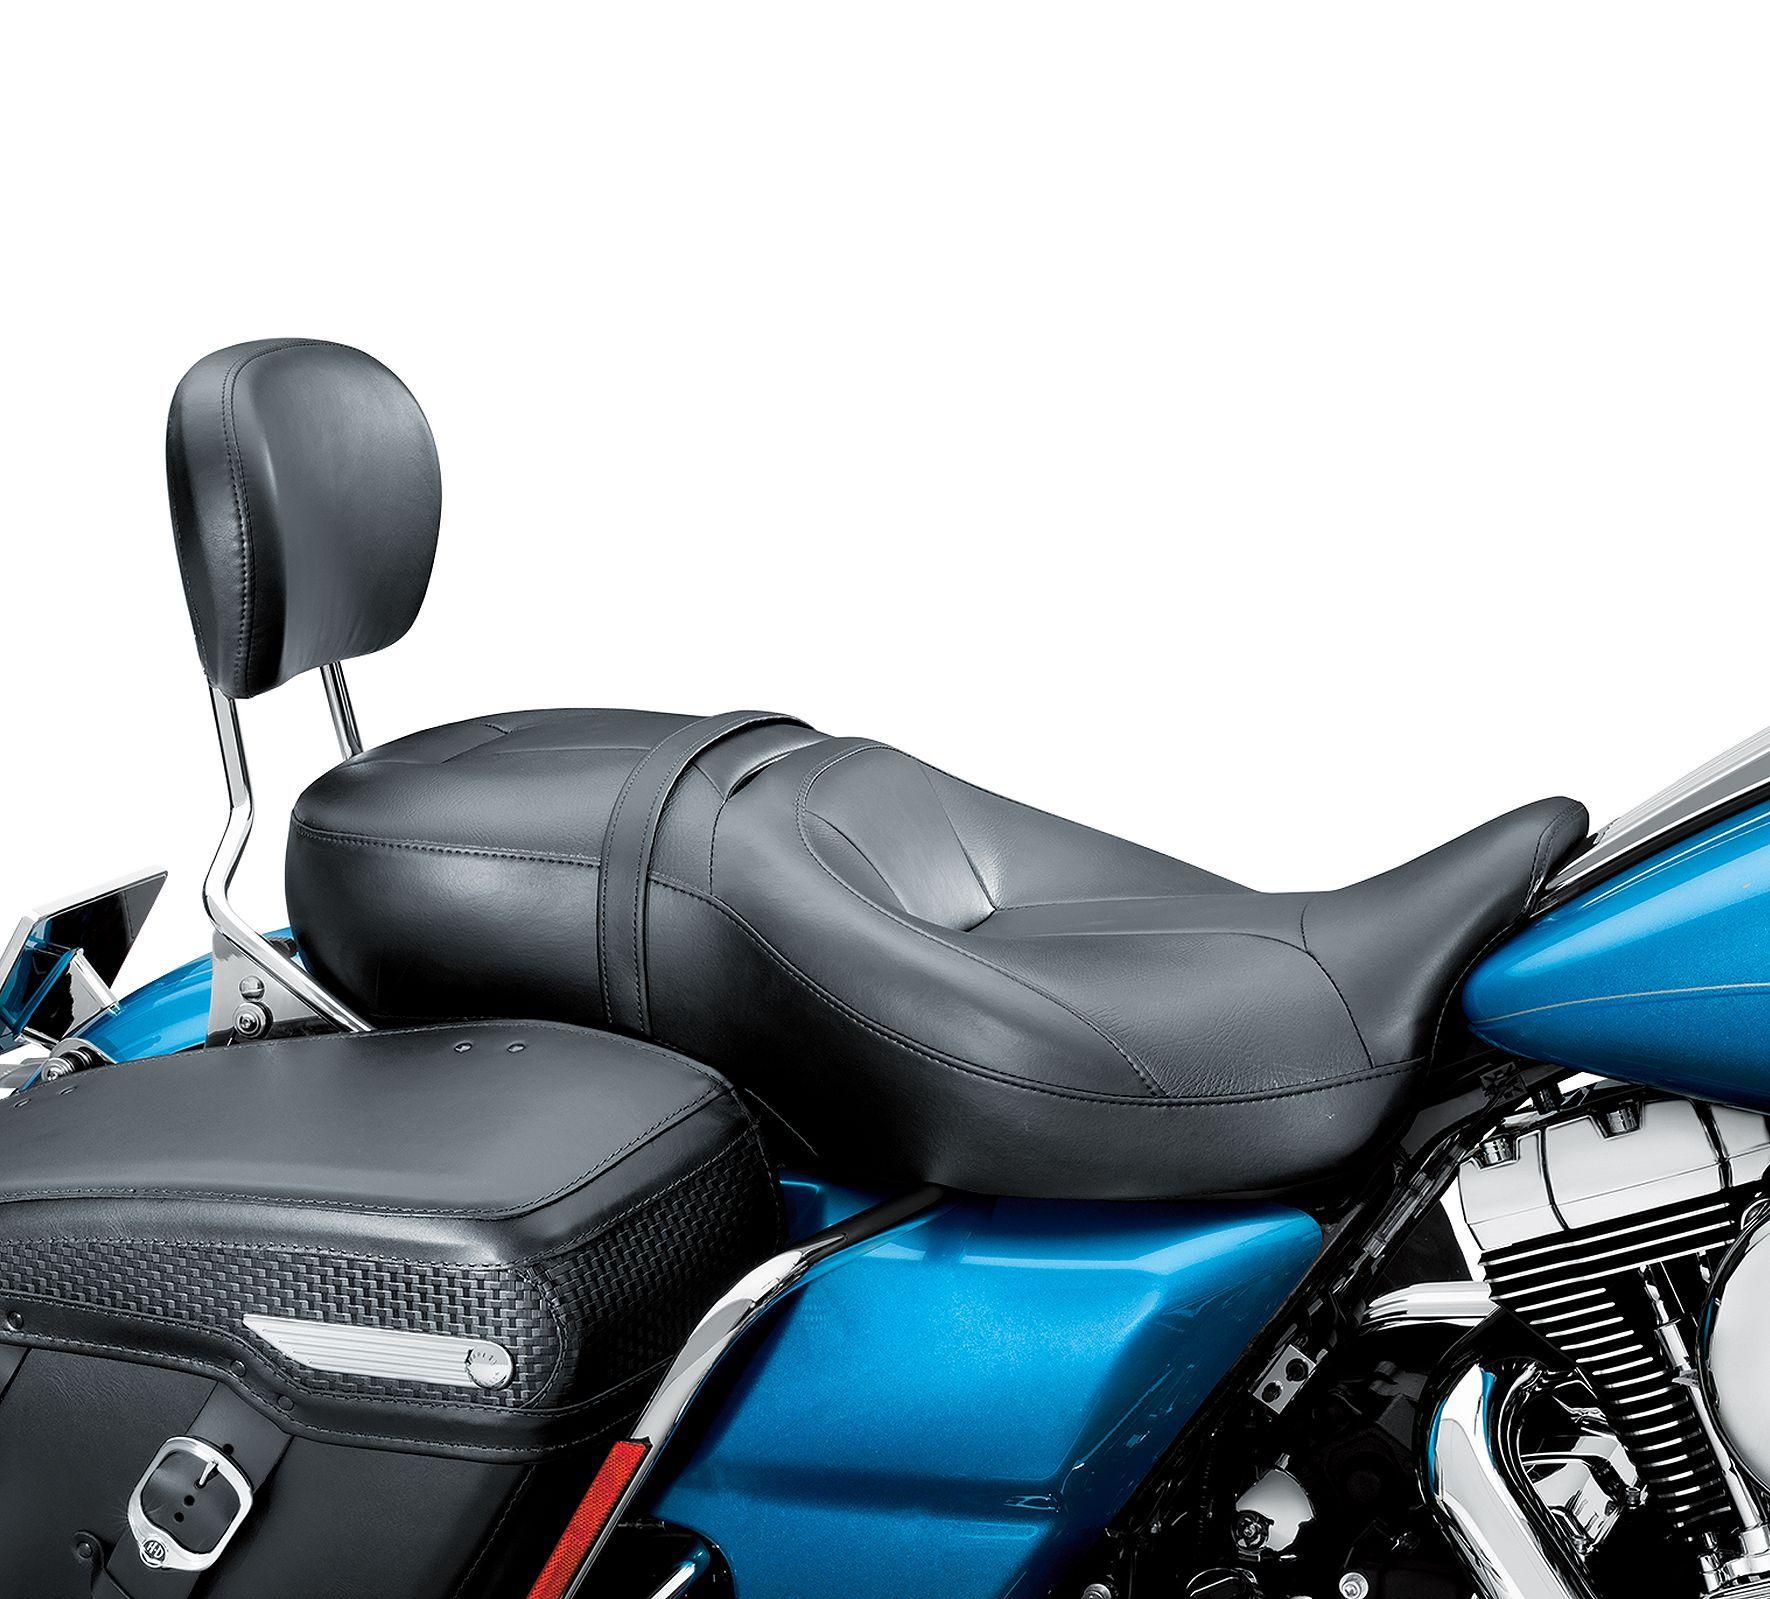 Hammock Rider Touring Seat | For the bike | Harley davidson